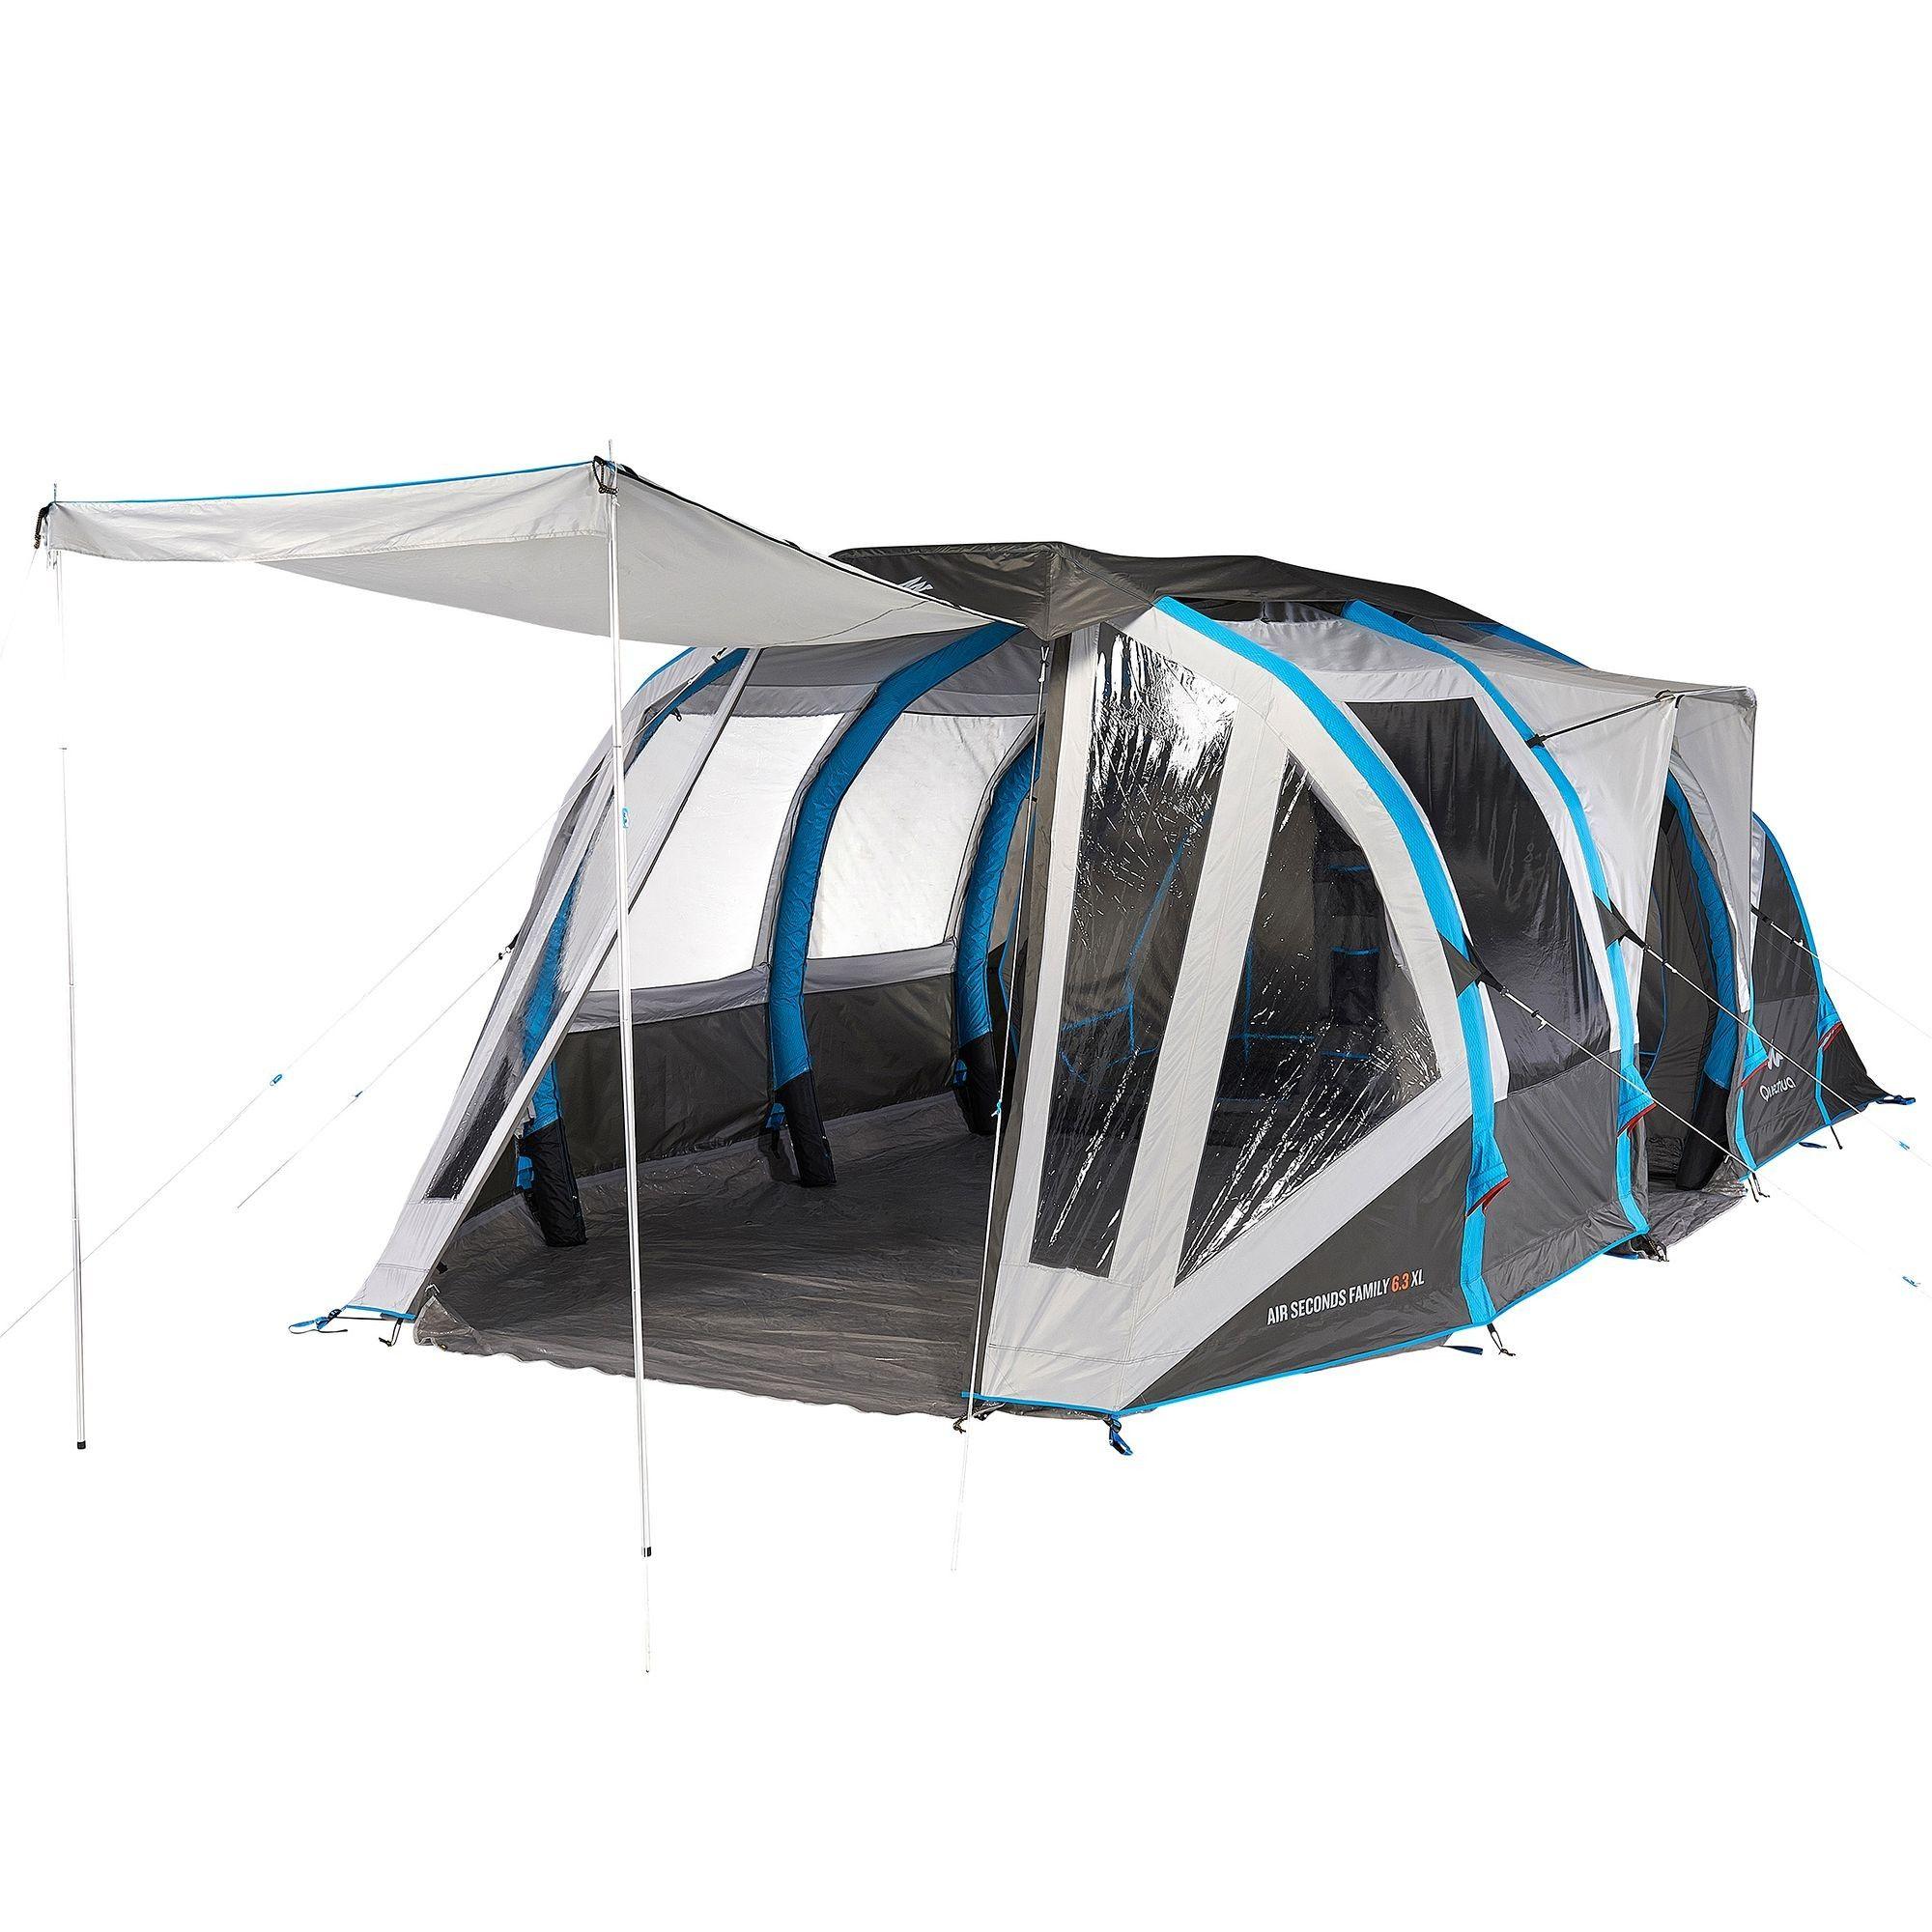 Tente AIR SECONDS FAMILY 6.3XL QUECHUA prix promo Tente Decathlon 549.90 € TTC